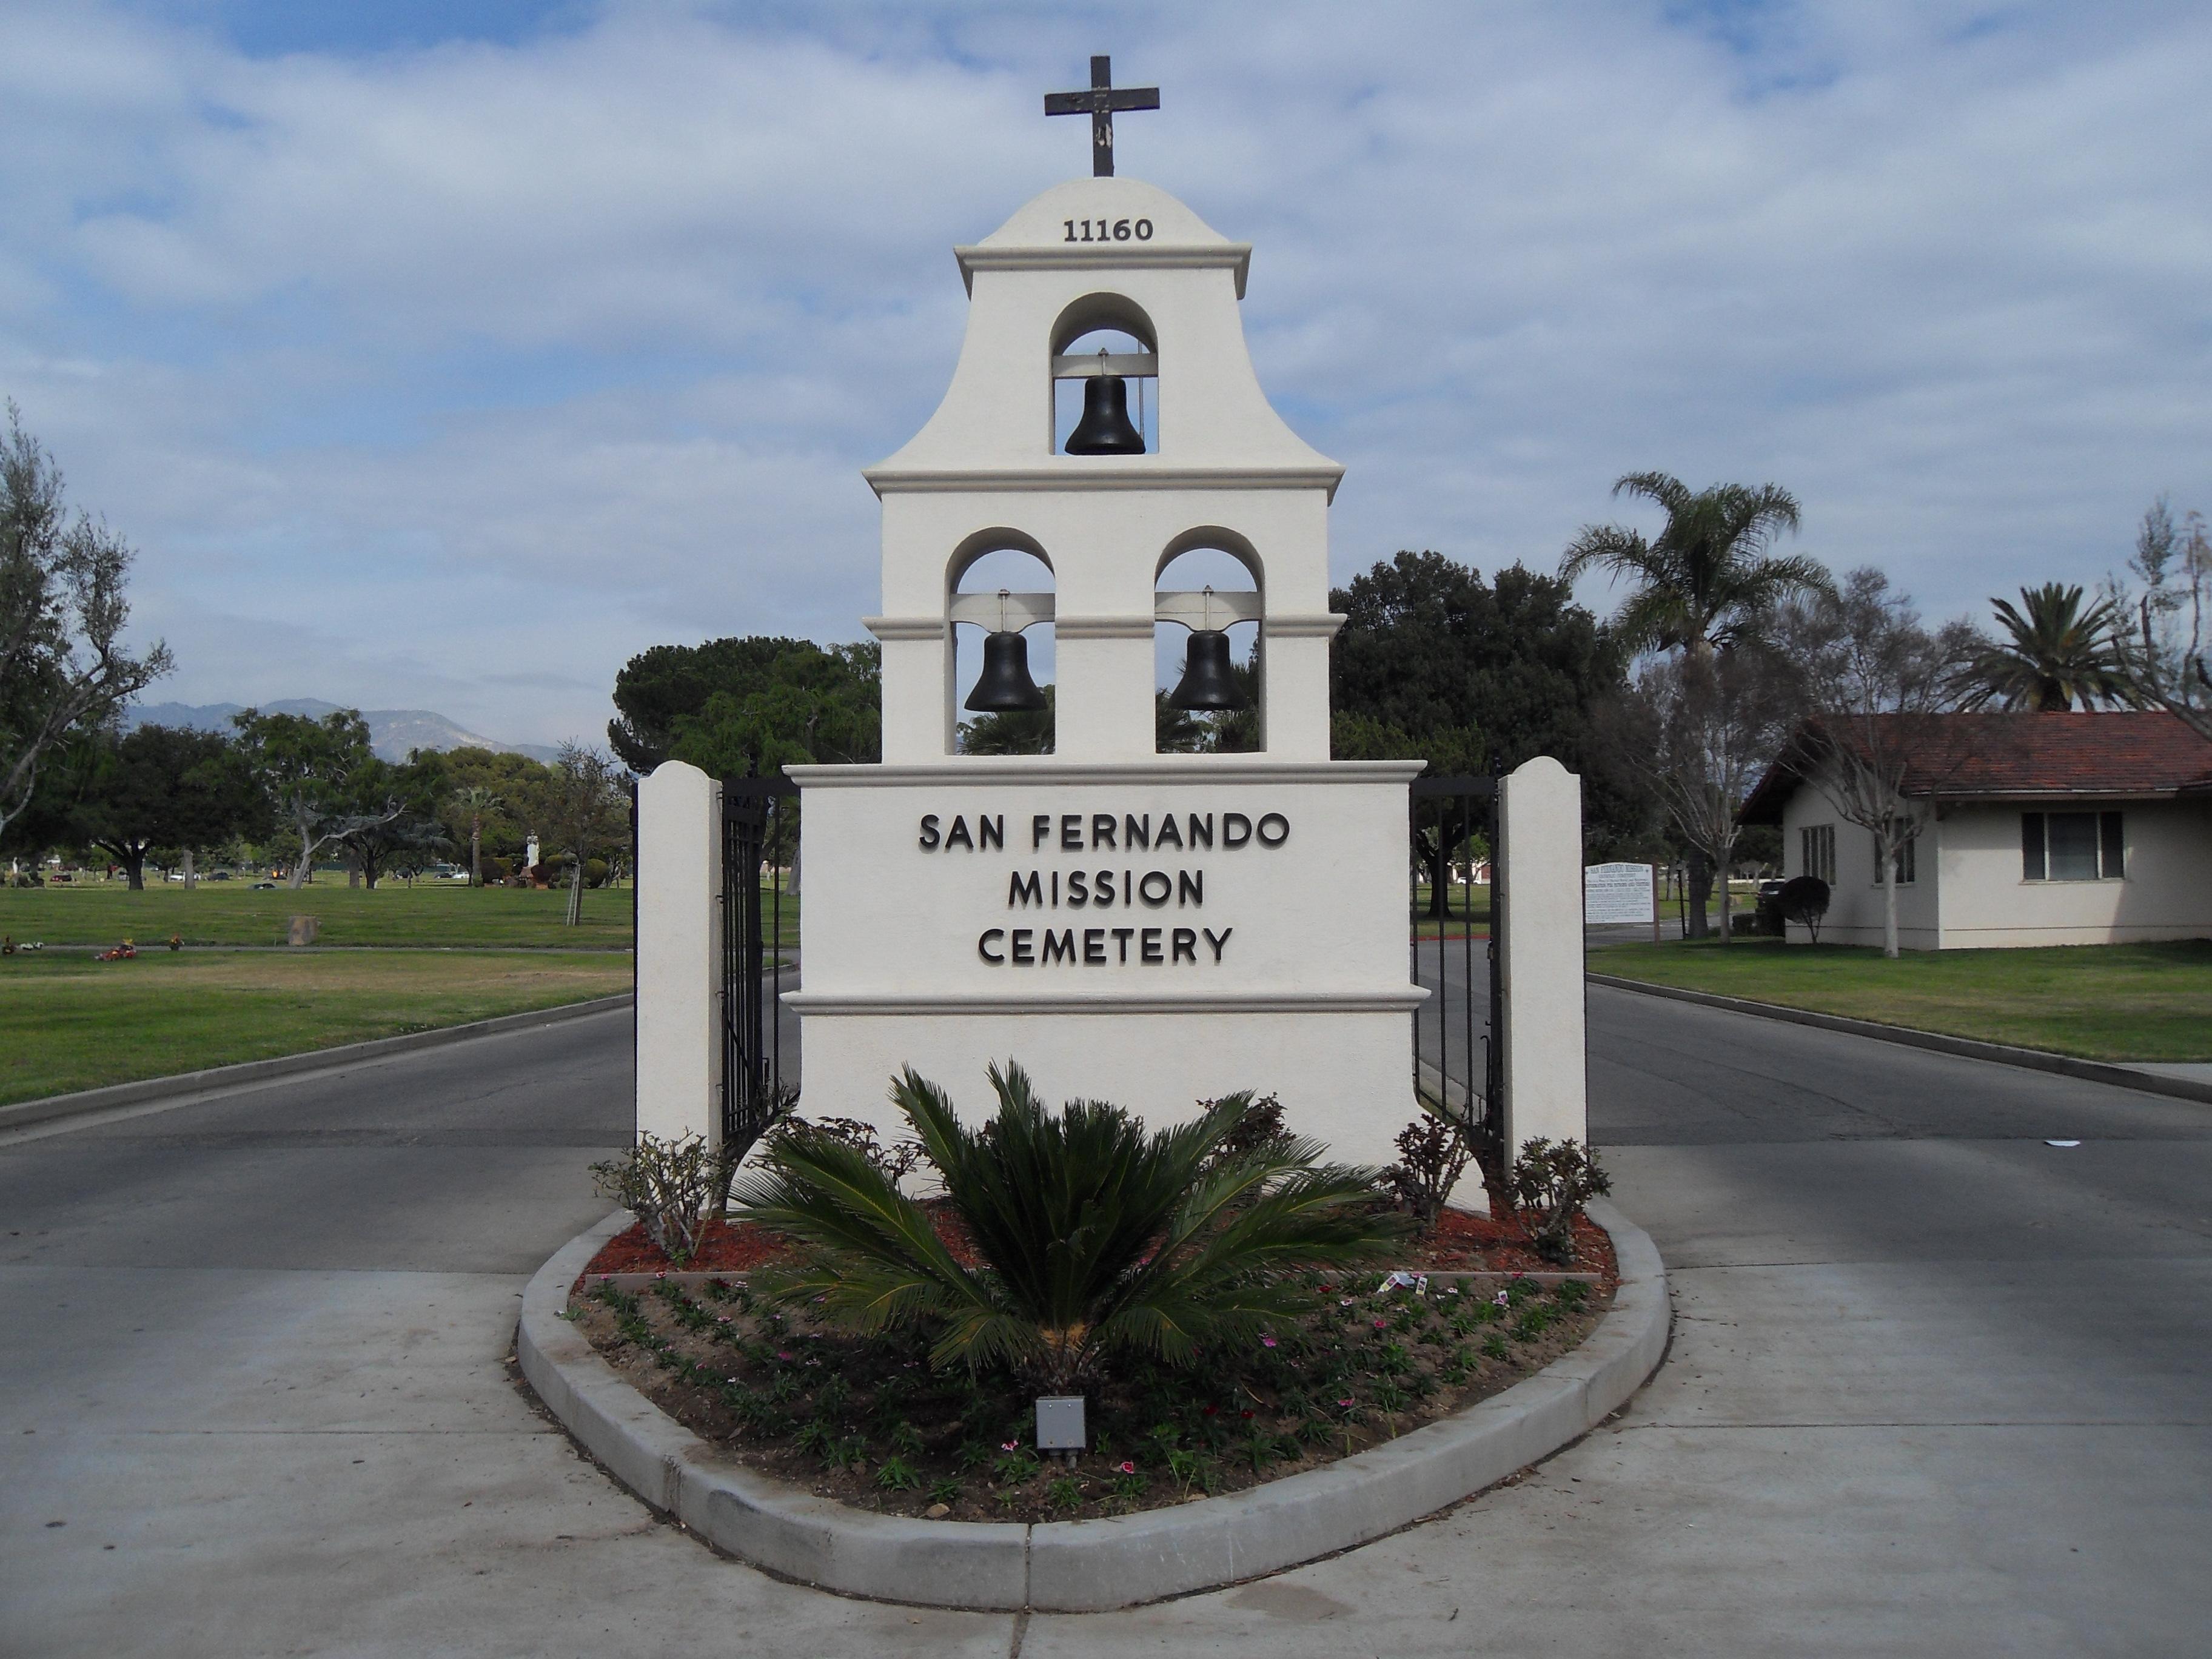 san fernando mission cemetery in mission hills california find